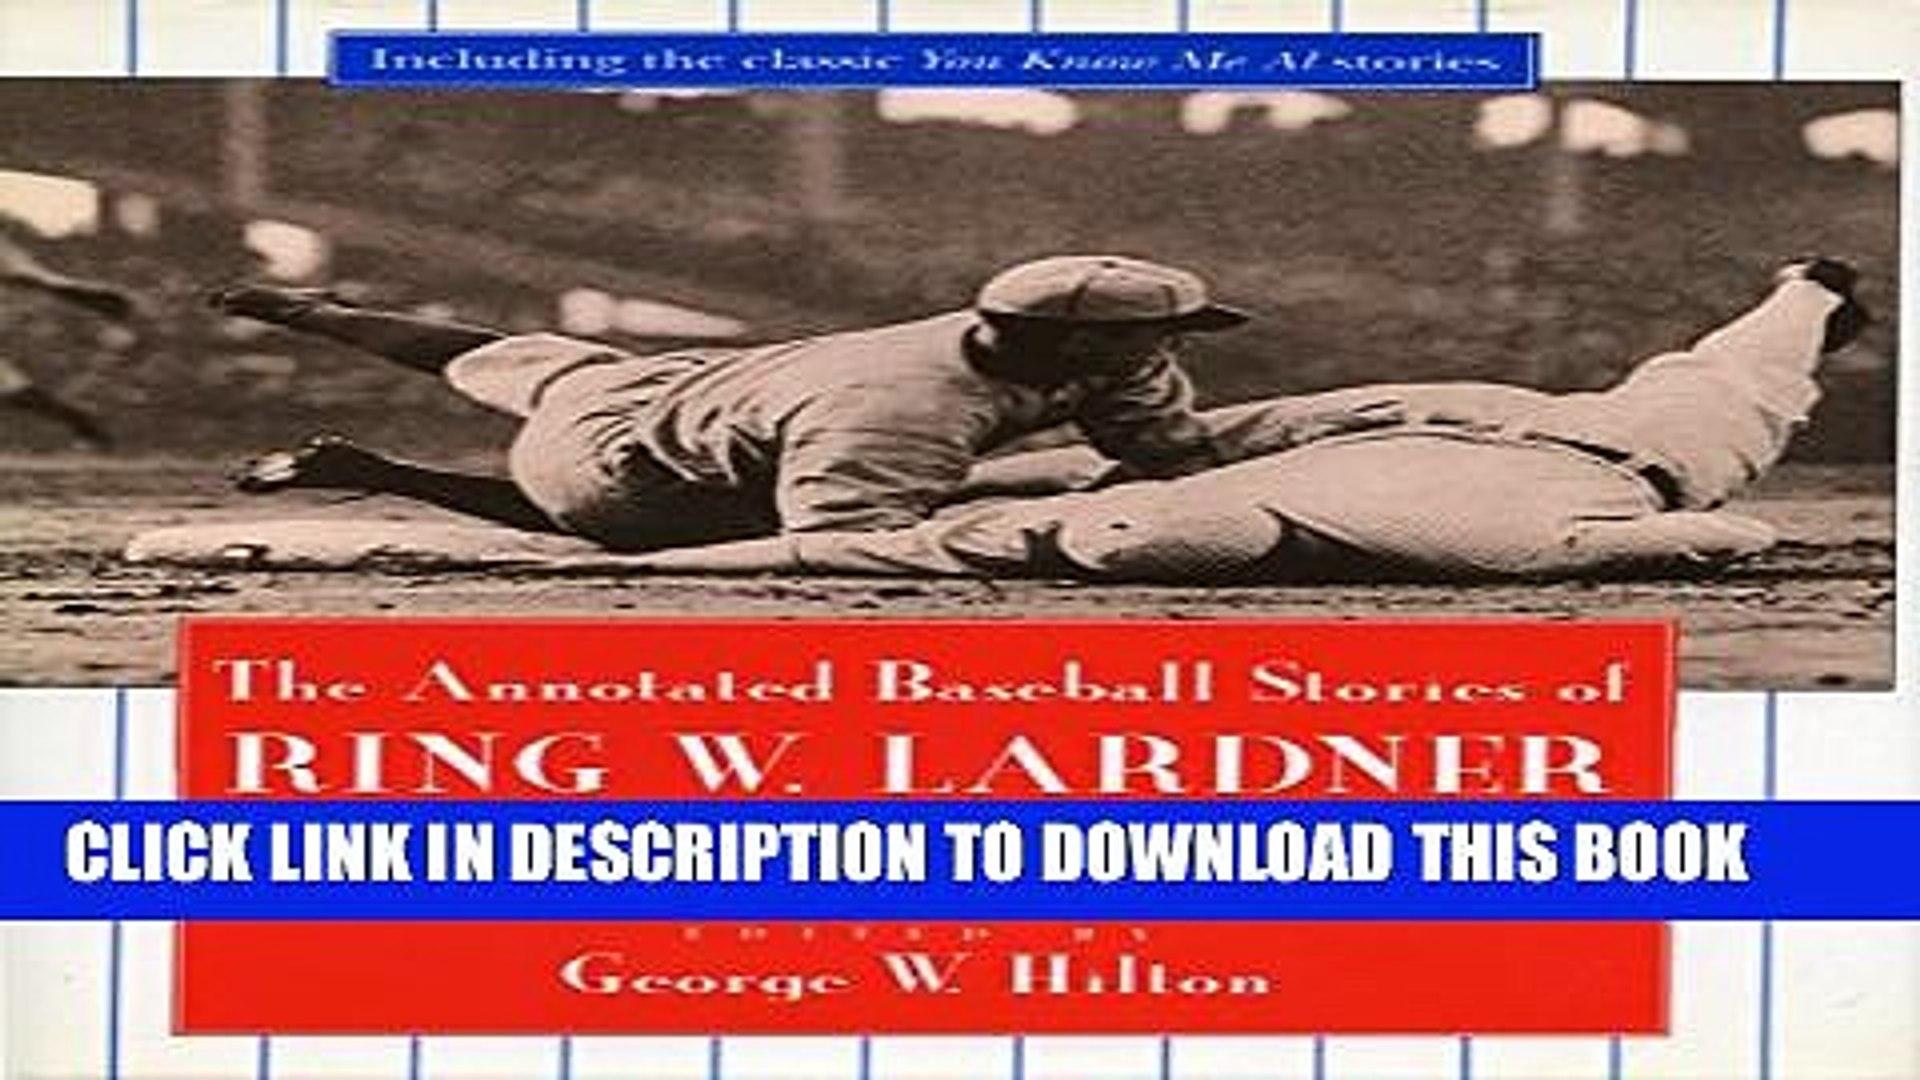 [PDF] The Annotated Baseball Stories of Ring W. Lardner, 1914-1919 [Online Books]